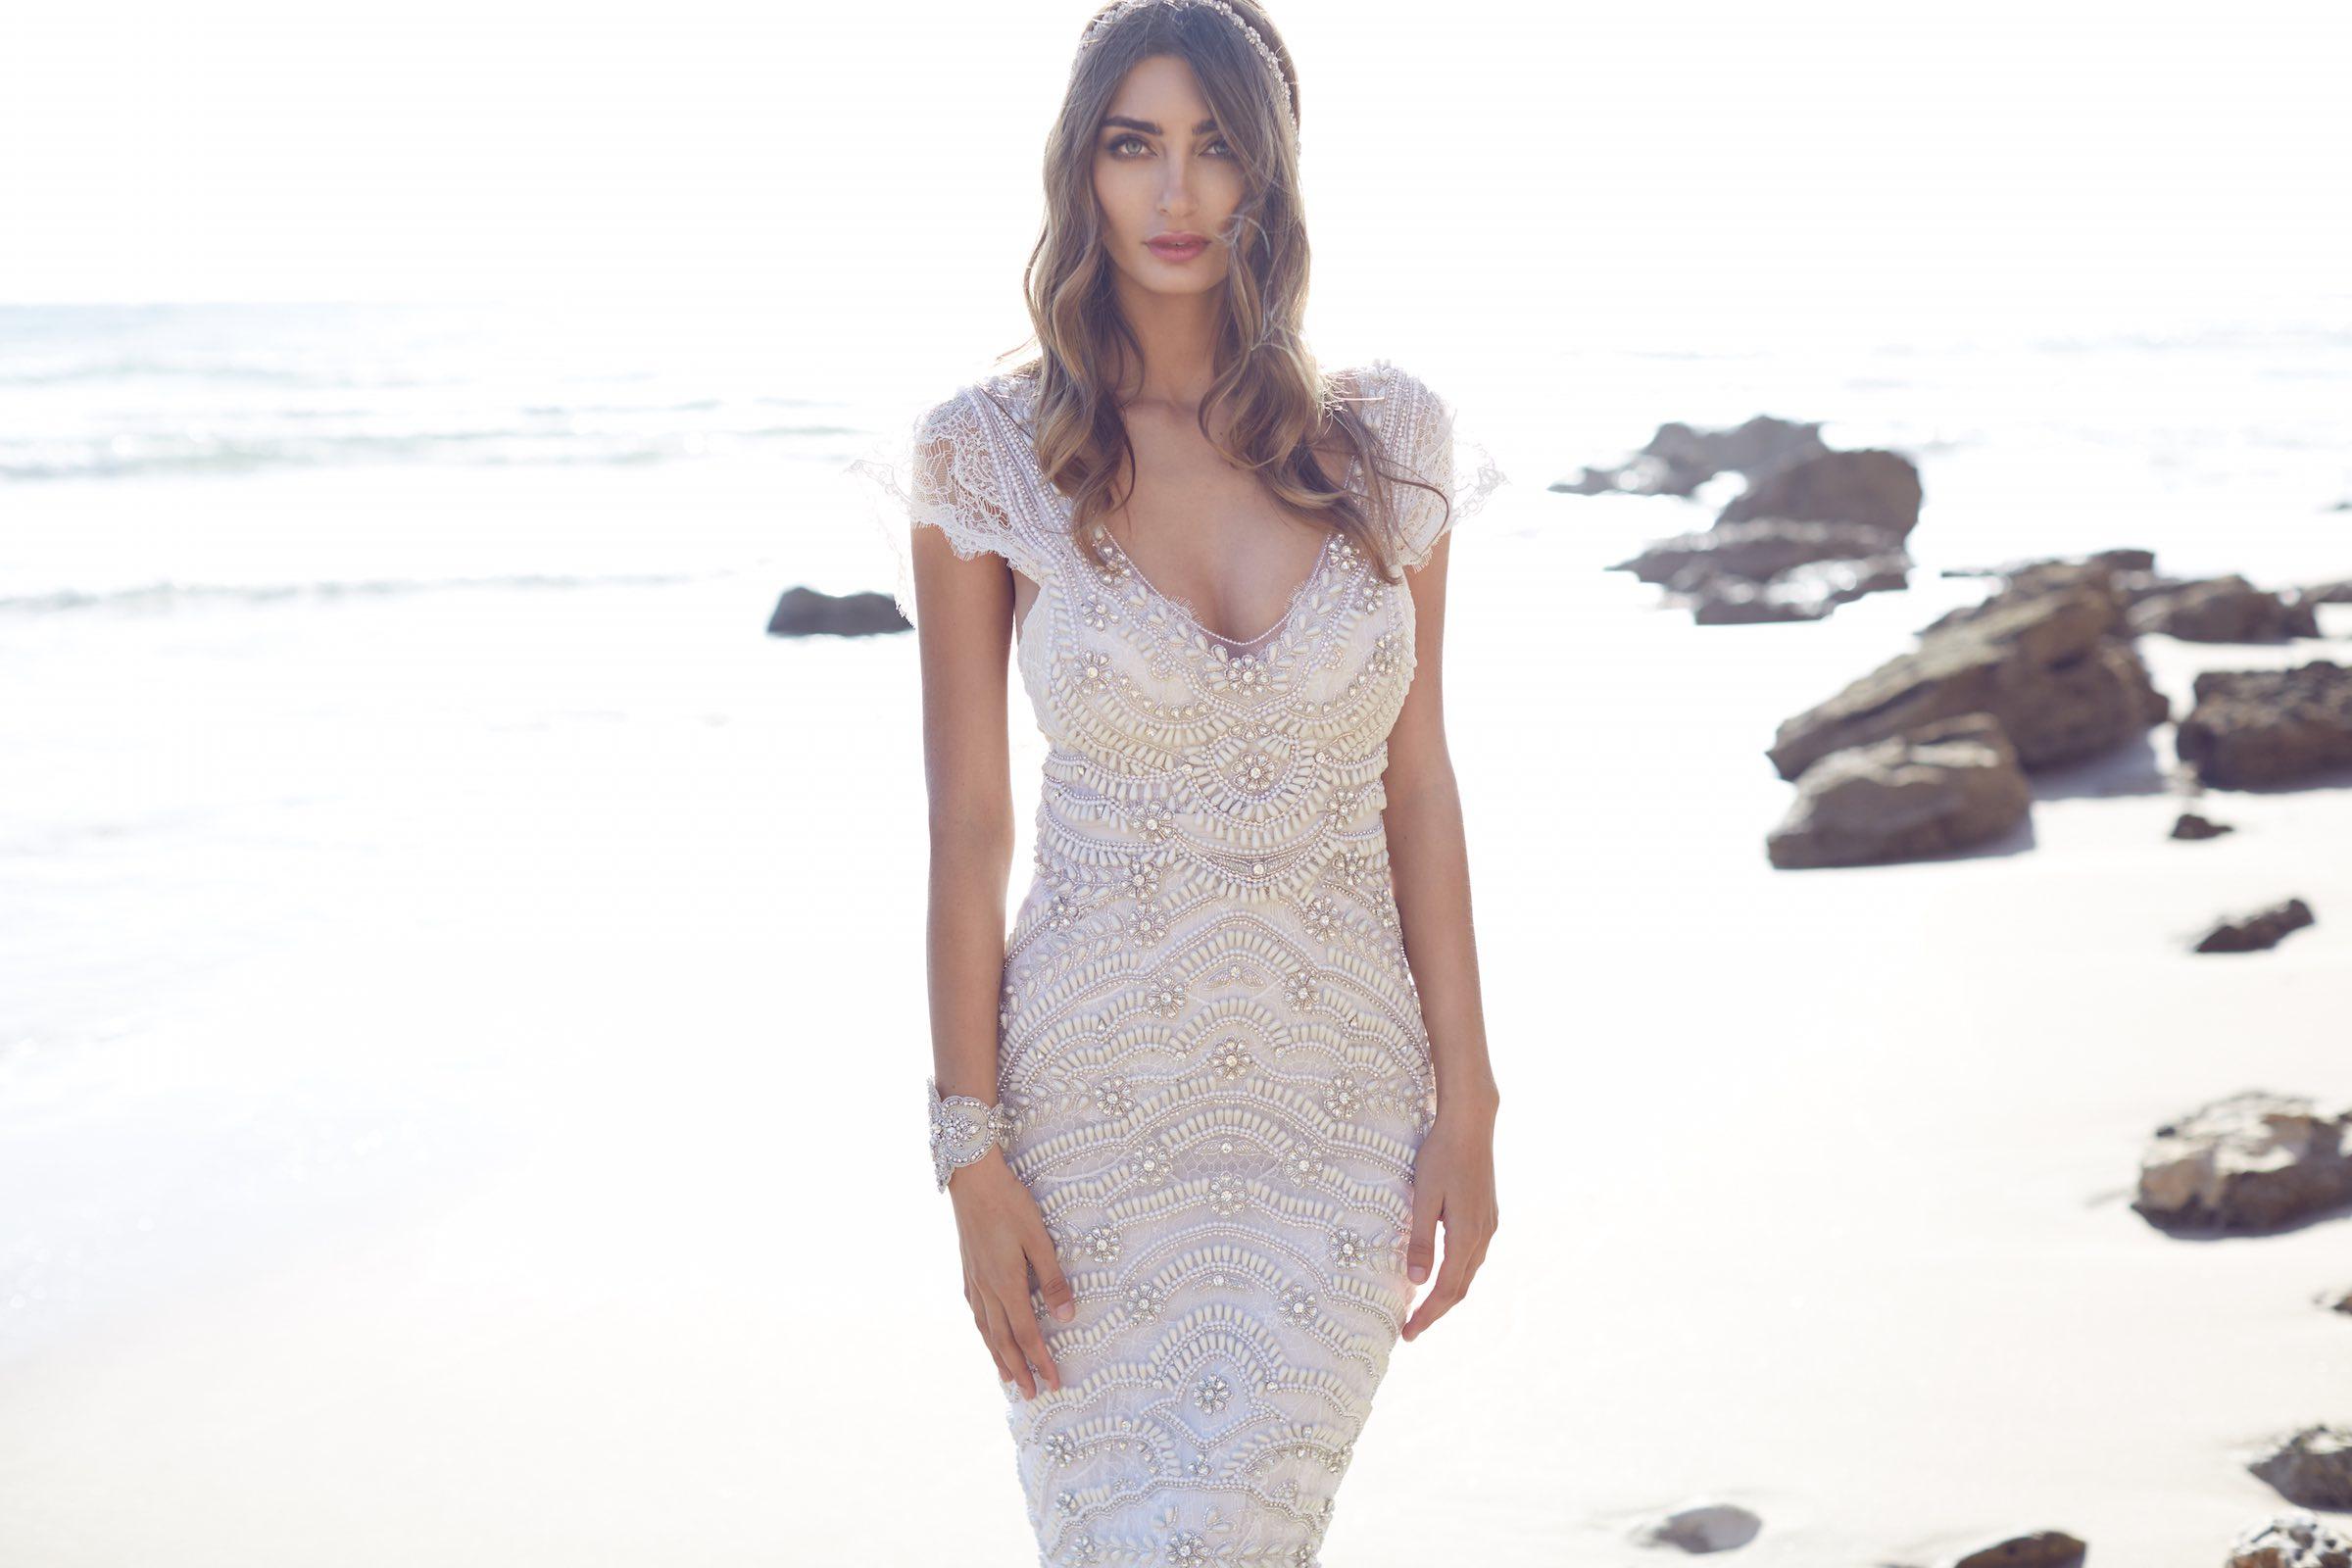 ivory-and-beau-bridal-boutique-zodiac-wedding-style-savannah-wedding-gowns-savannah-wedding-dresses-earnest-loans-5.jpg